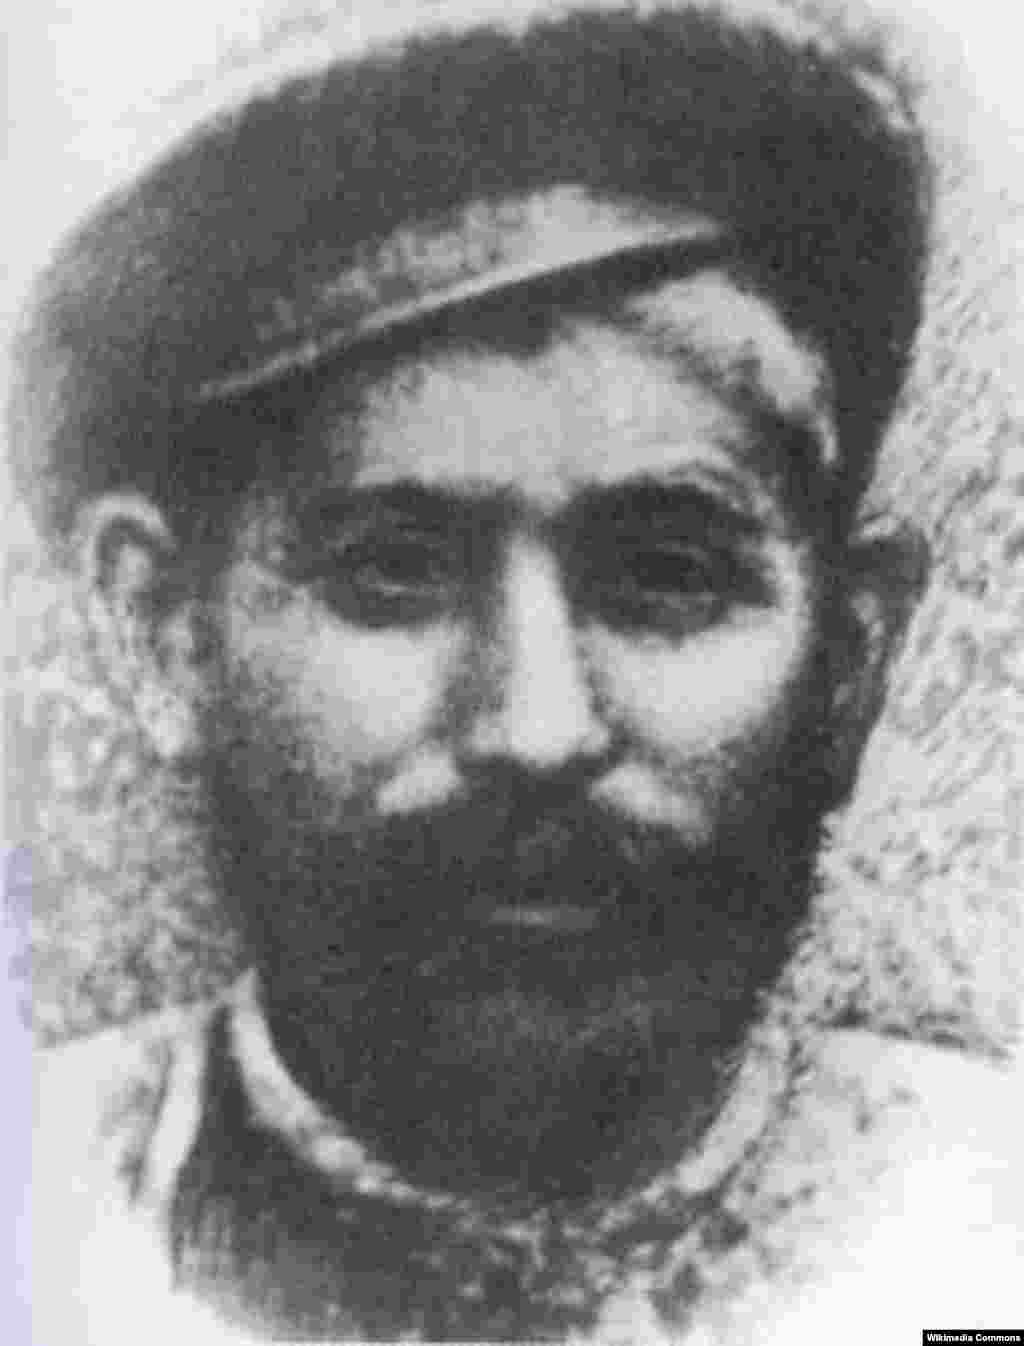 Stalin's father, Besarion Vanovis Dzhugashvili (1849/1850-1909), a cobbler. Photo undated.